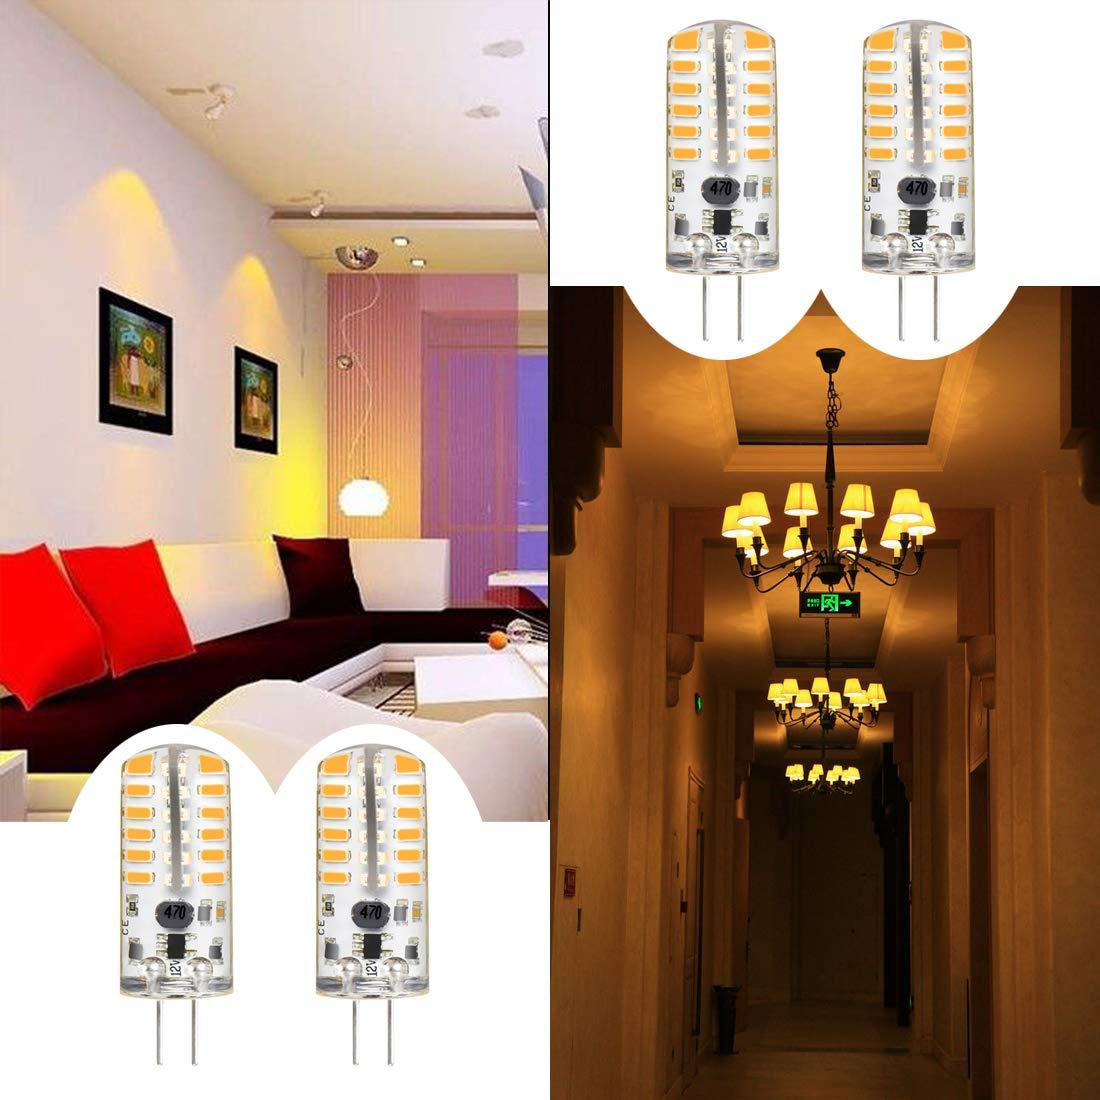 3W Warm White 12V Led Light Bulb G4 3W LED Bulb Bi-Pin Socket Warm White Light Lamps AC//DC 12V Non-dimmable Equivalent to 20W ~ 25W T3 Halogen Track Bulb Replacement LED Bulbs 10pcs